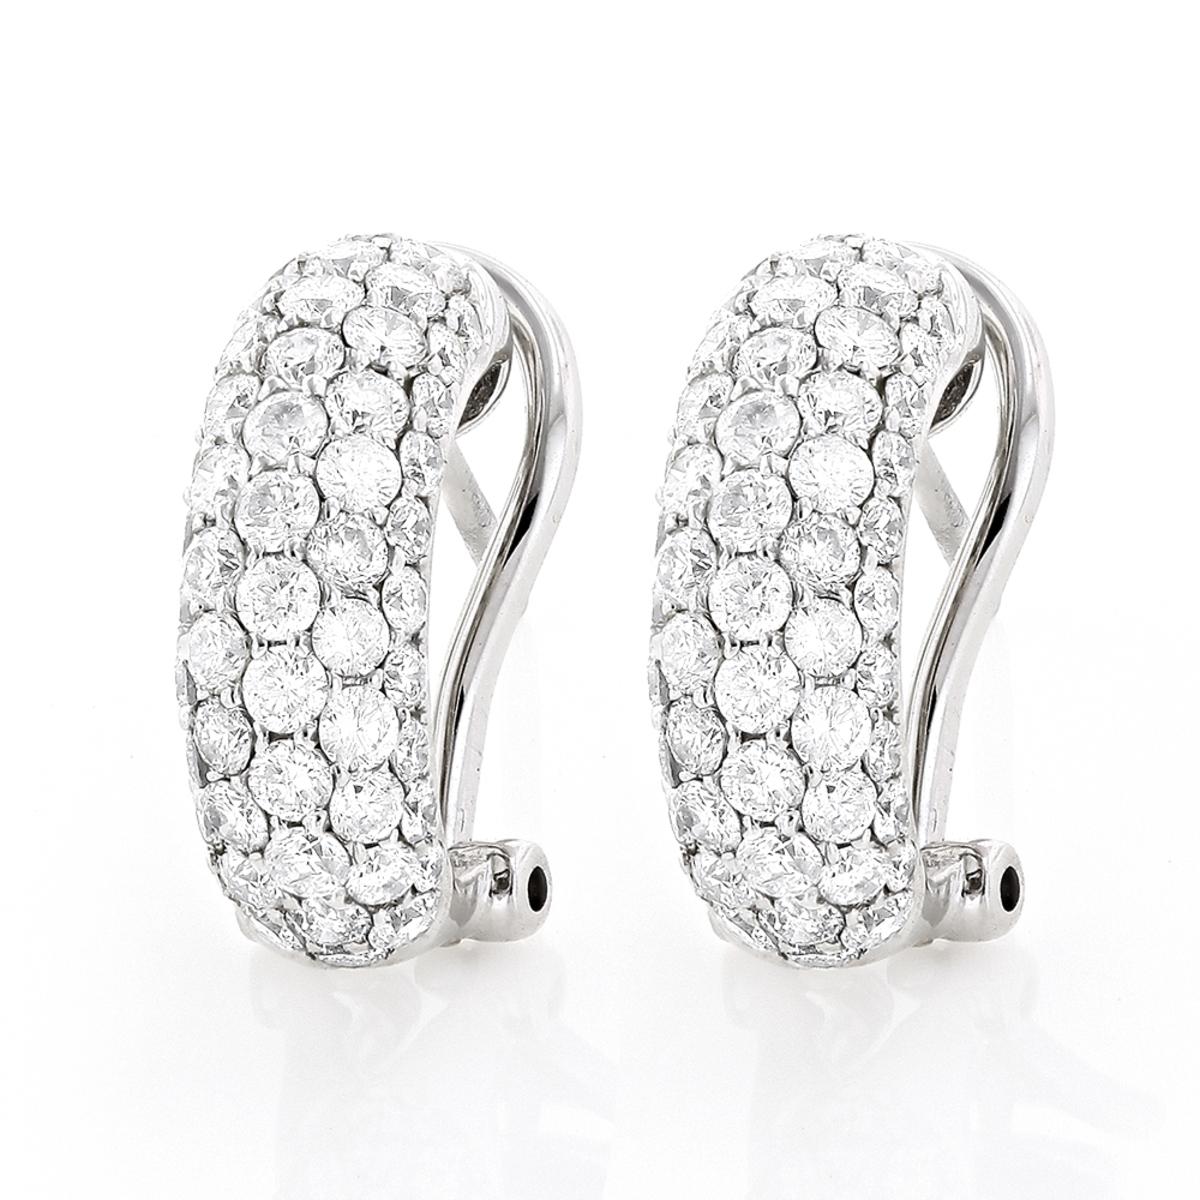 14K Gold Round Pave Diamond Hoop Earrings 1.87ct